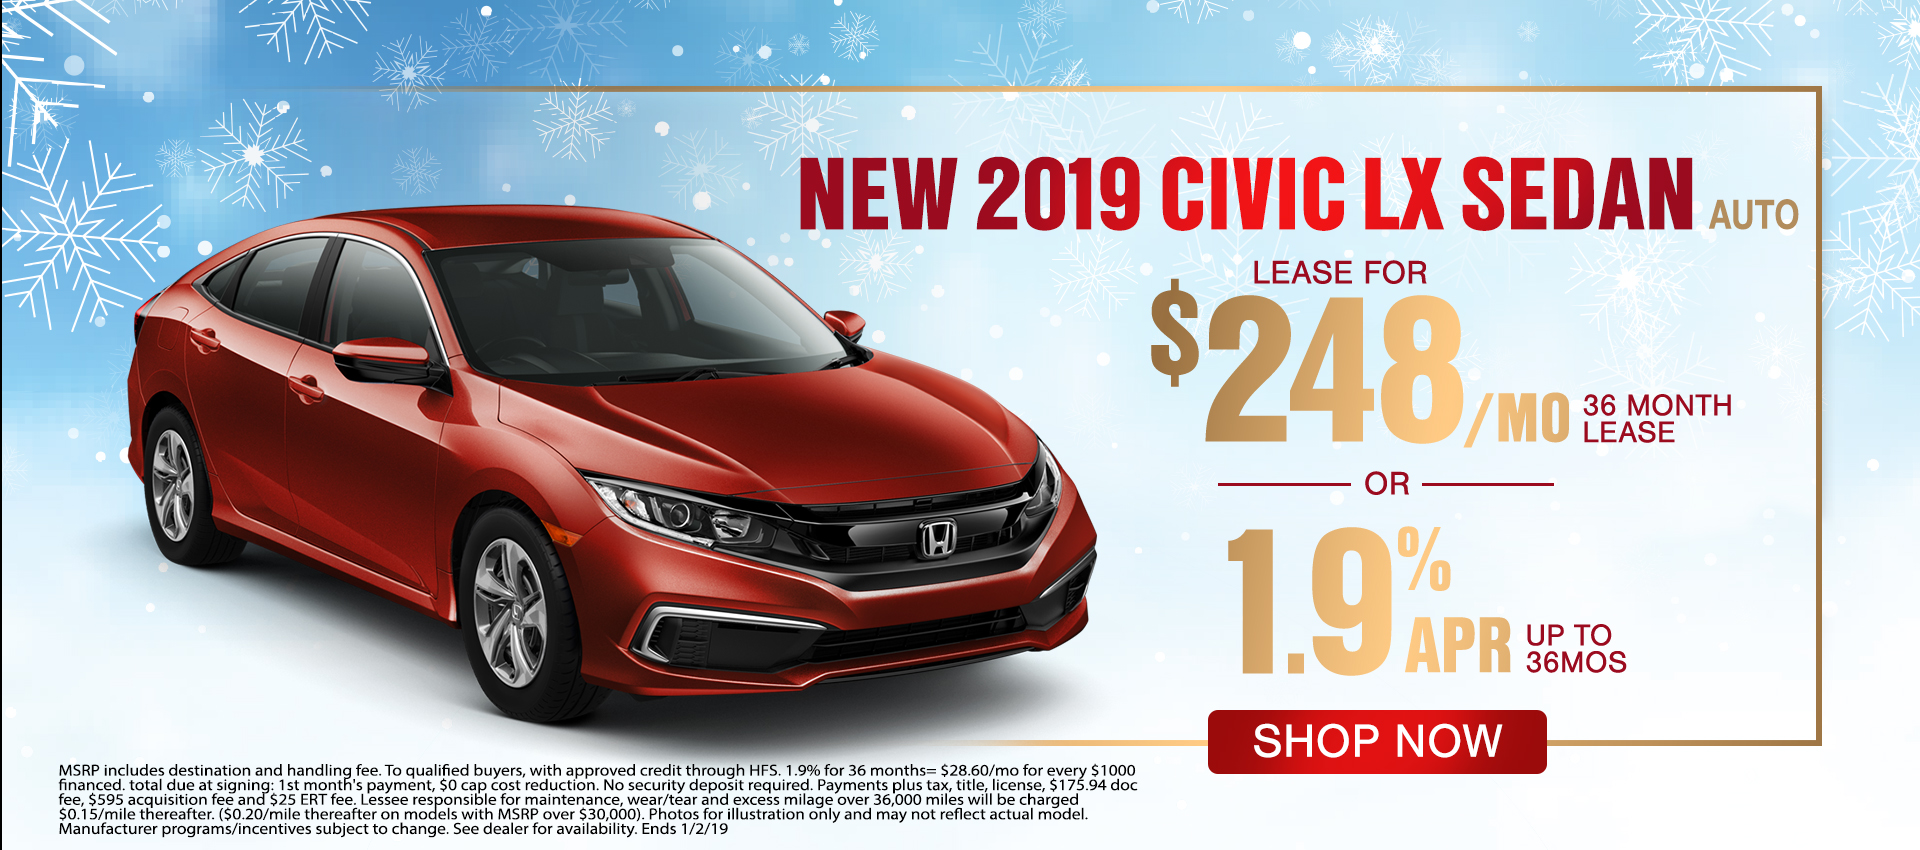 Civic Sedan Lease For 248